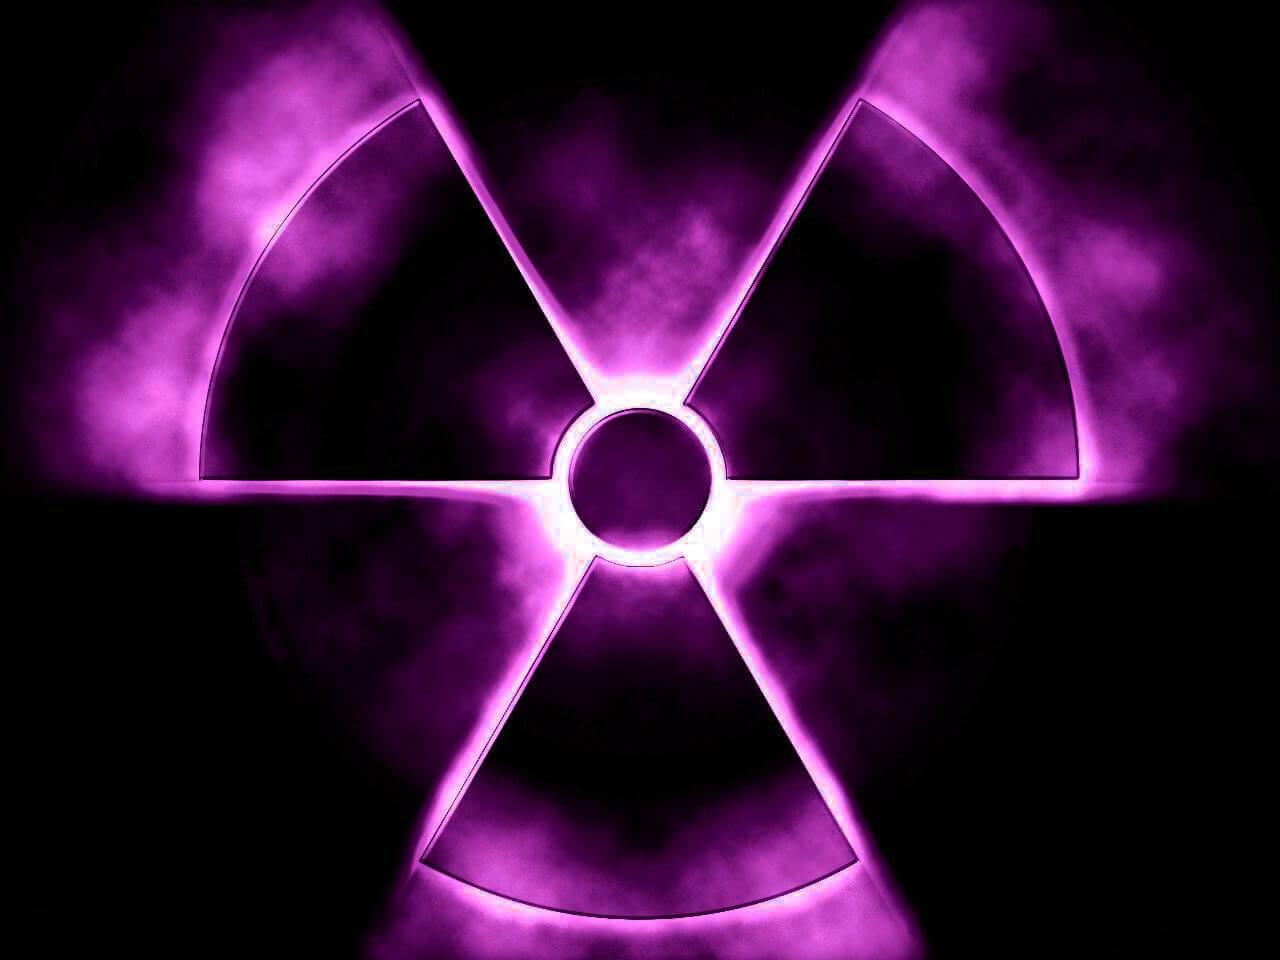 AB'nin Radyasyon Riskli İthalata Karşı Düzenlemesi